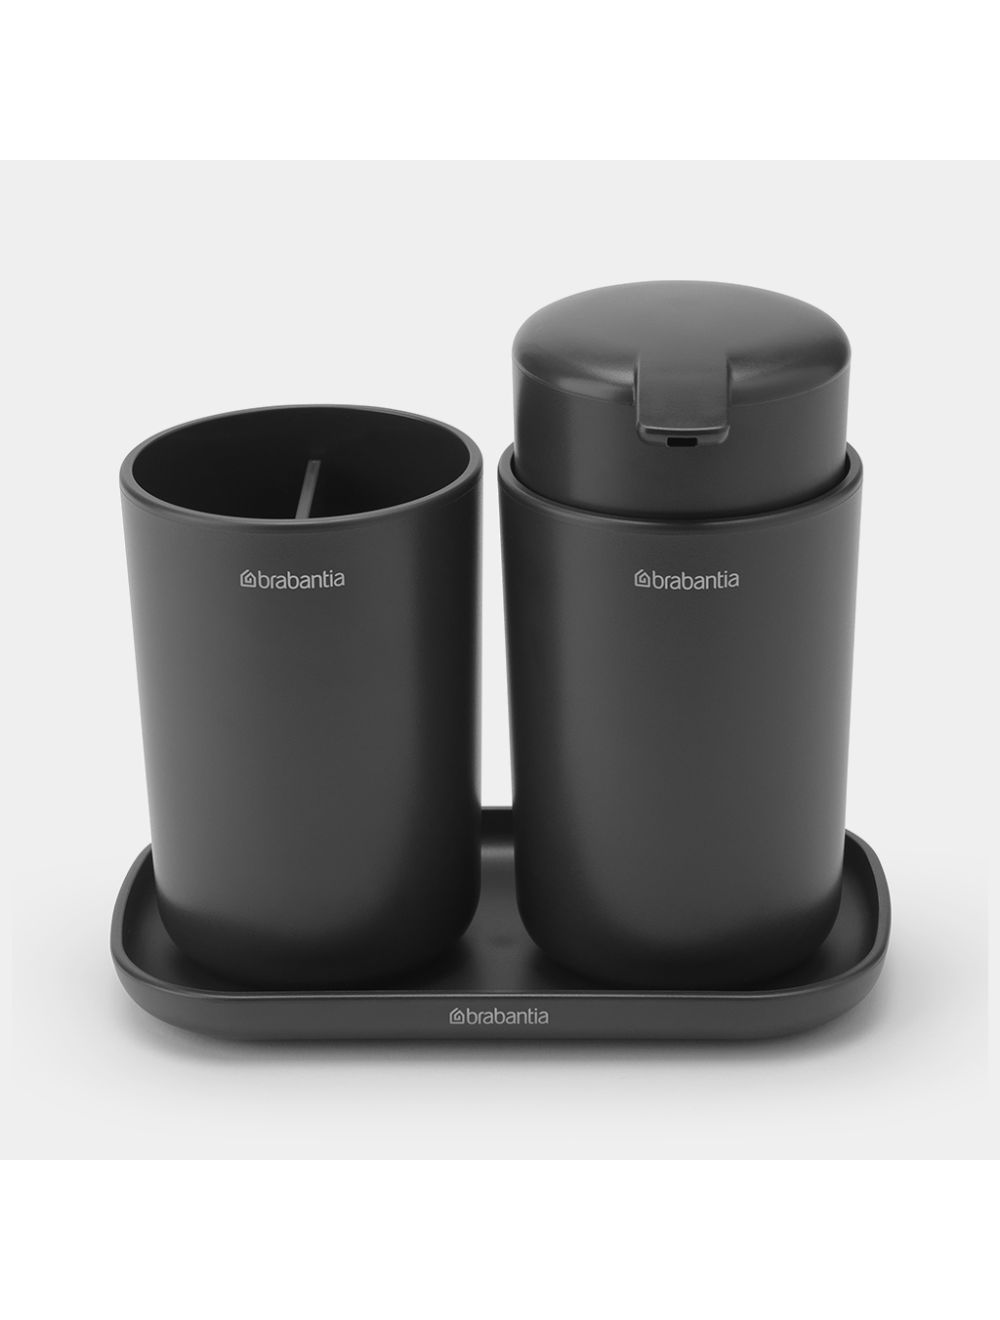 Brabantia Renew Bathroom Accessory Set, Brabantia Bathroom Accessories